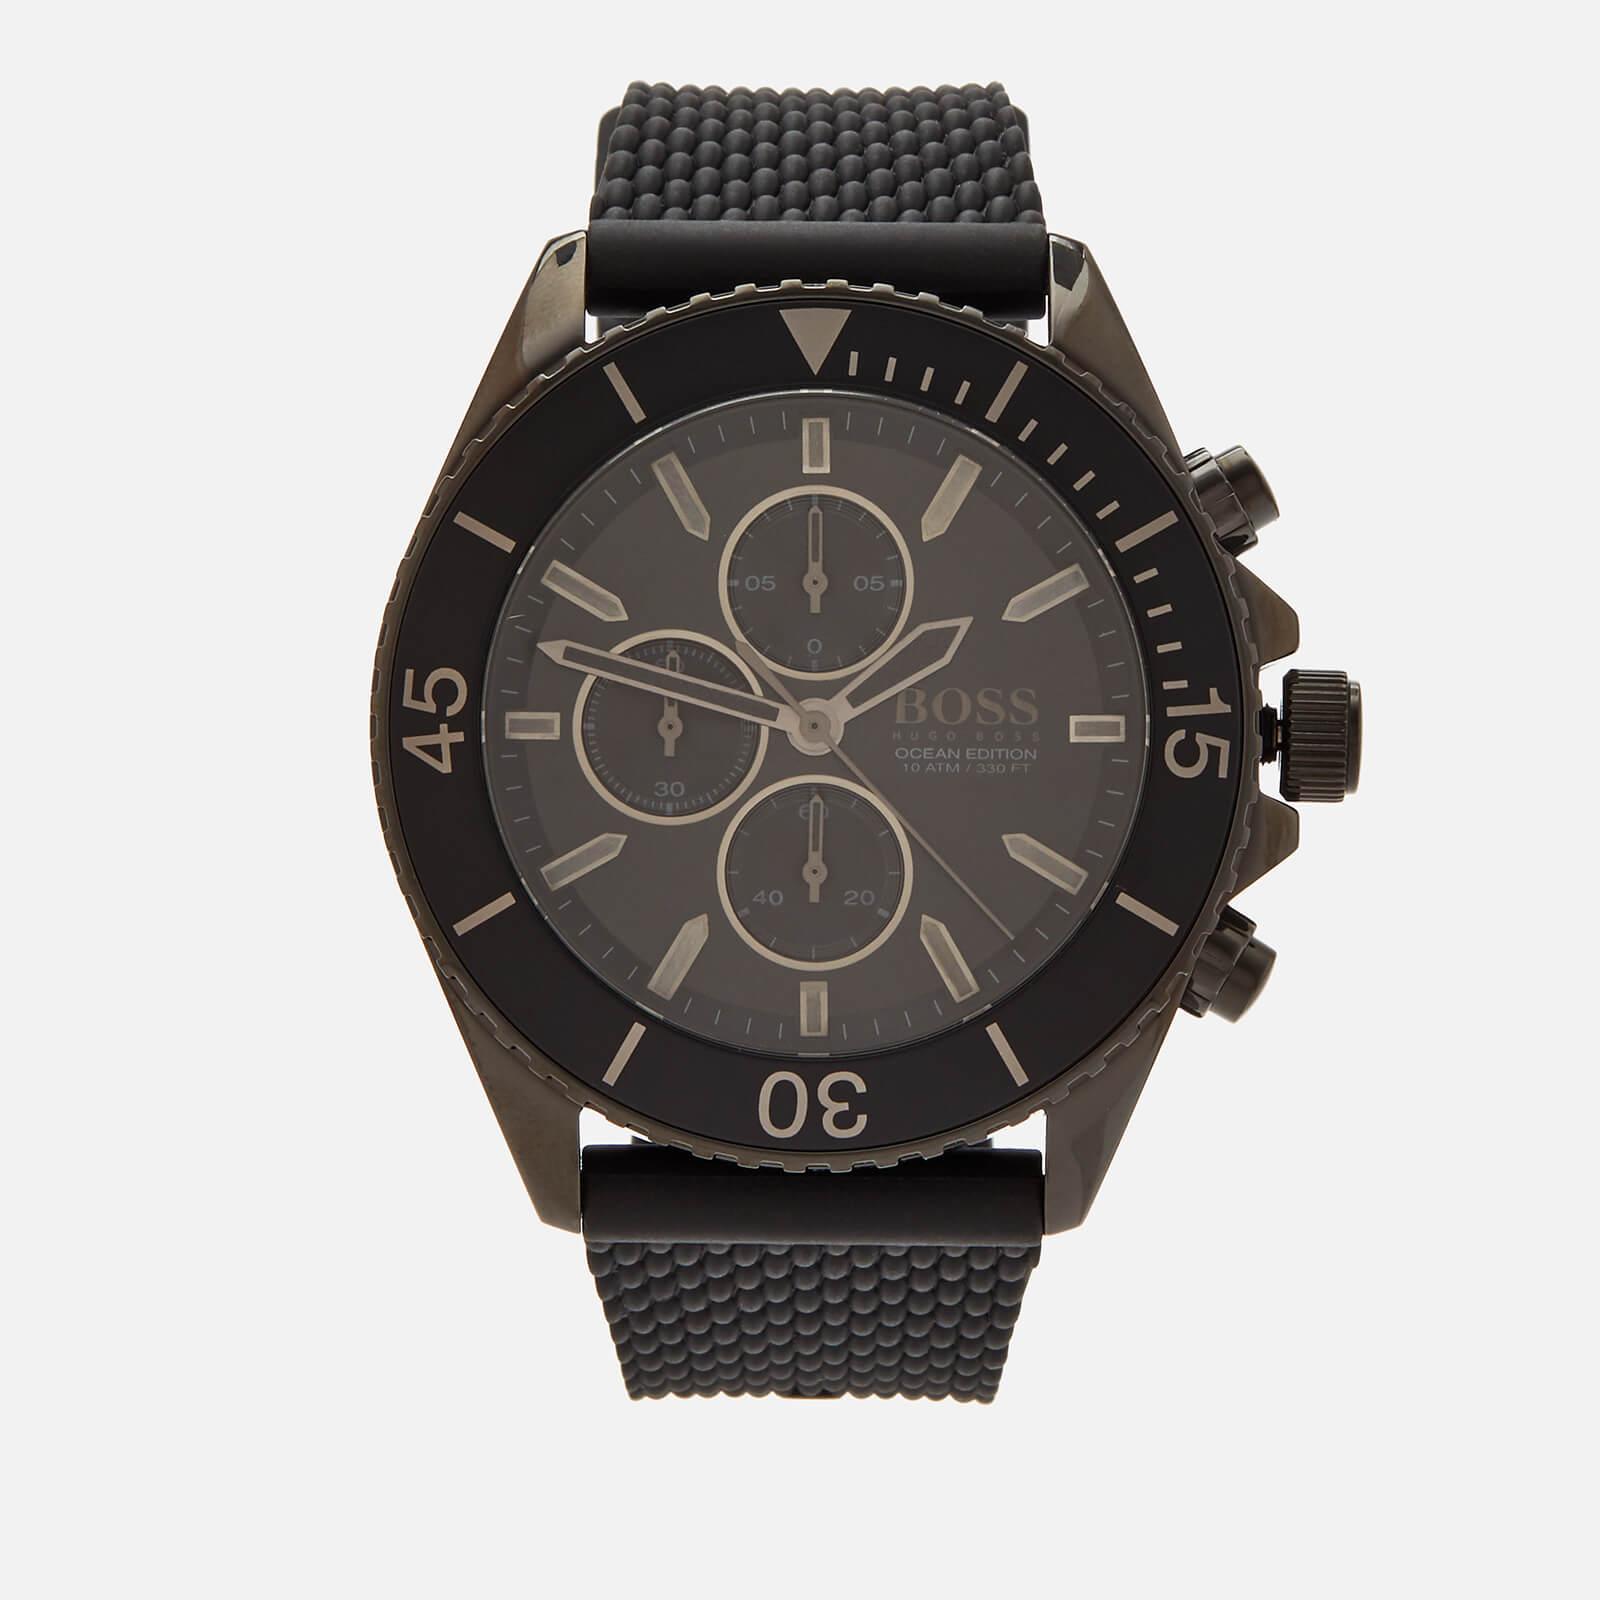 BOSS Hugo Boss Men's Ocean Edition Mesh Strap Watch - Rouge Black